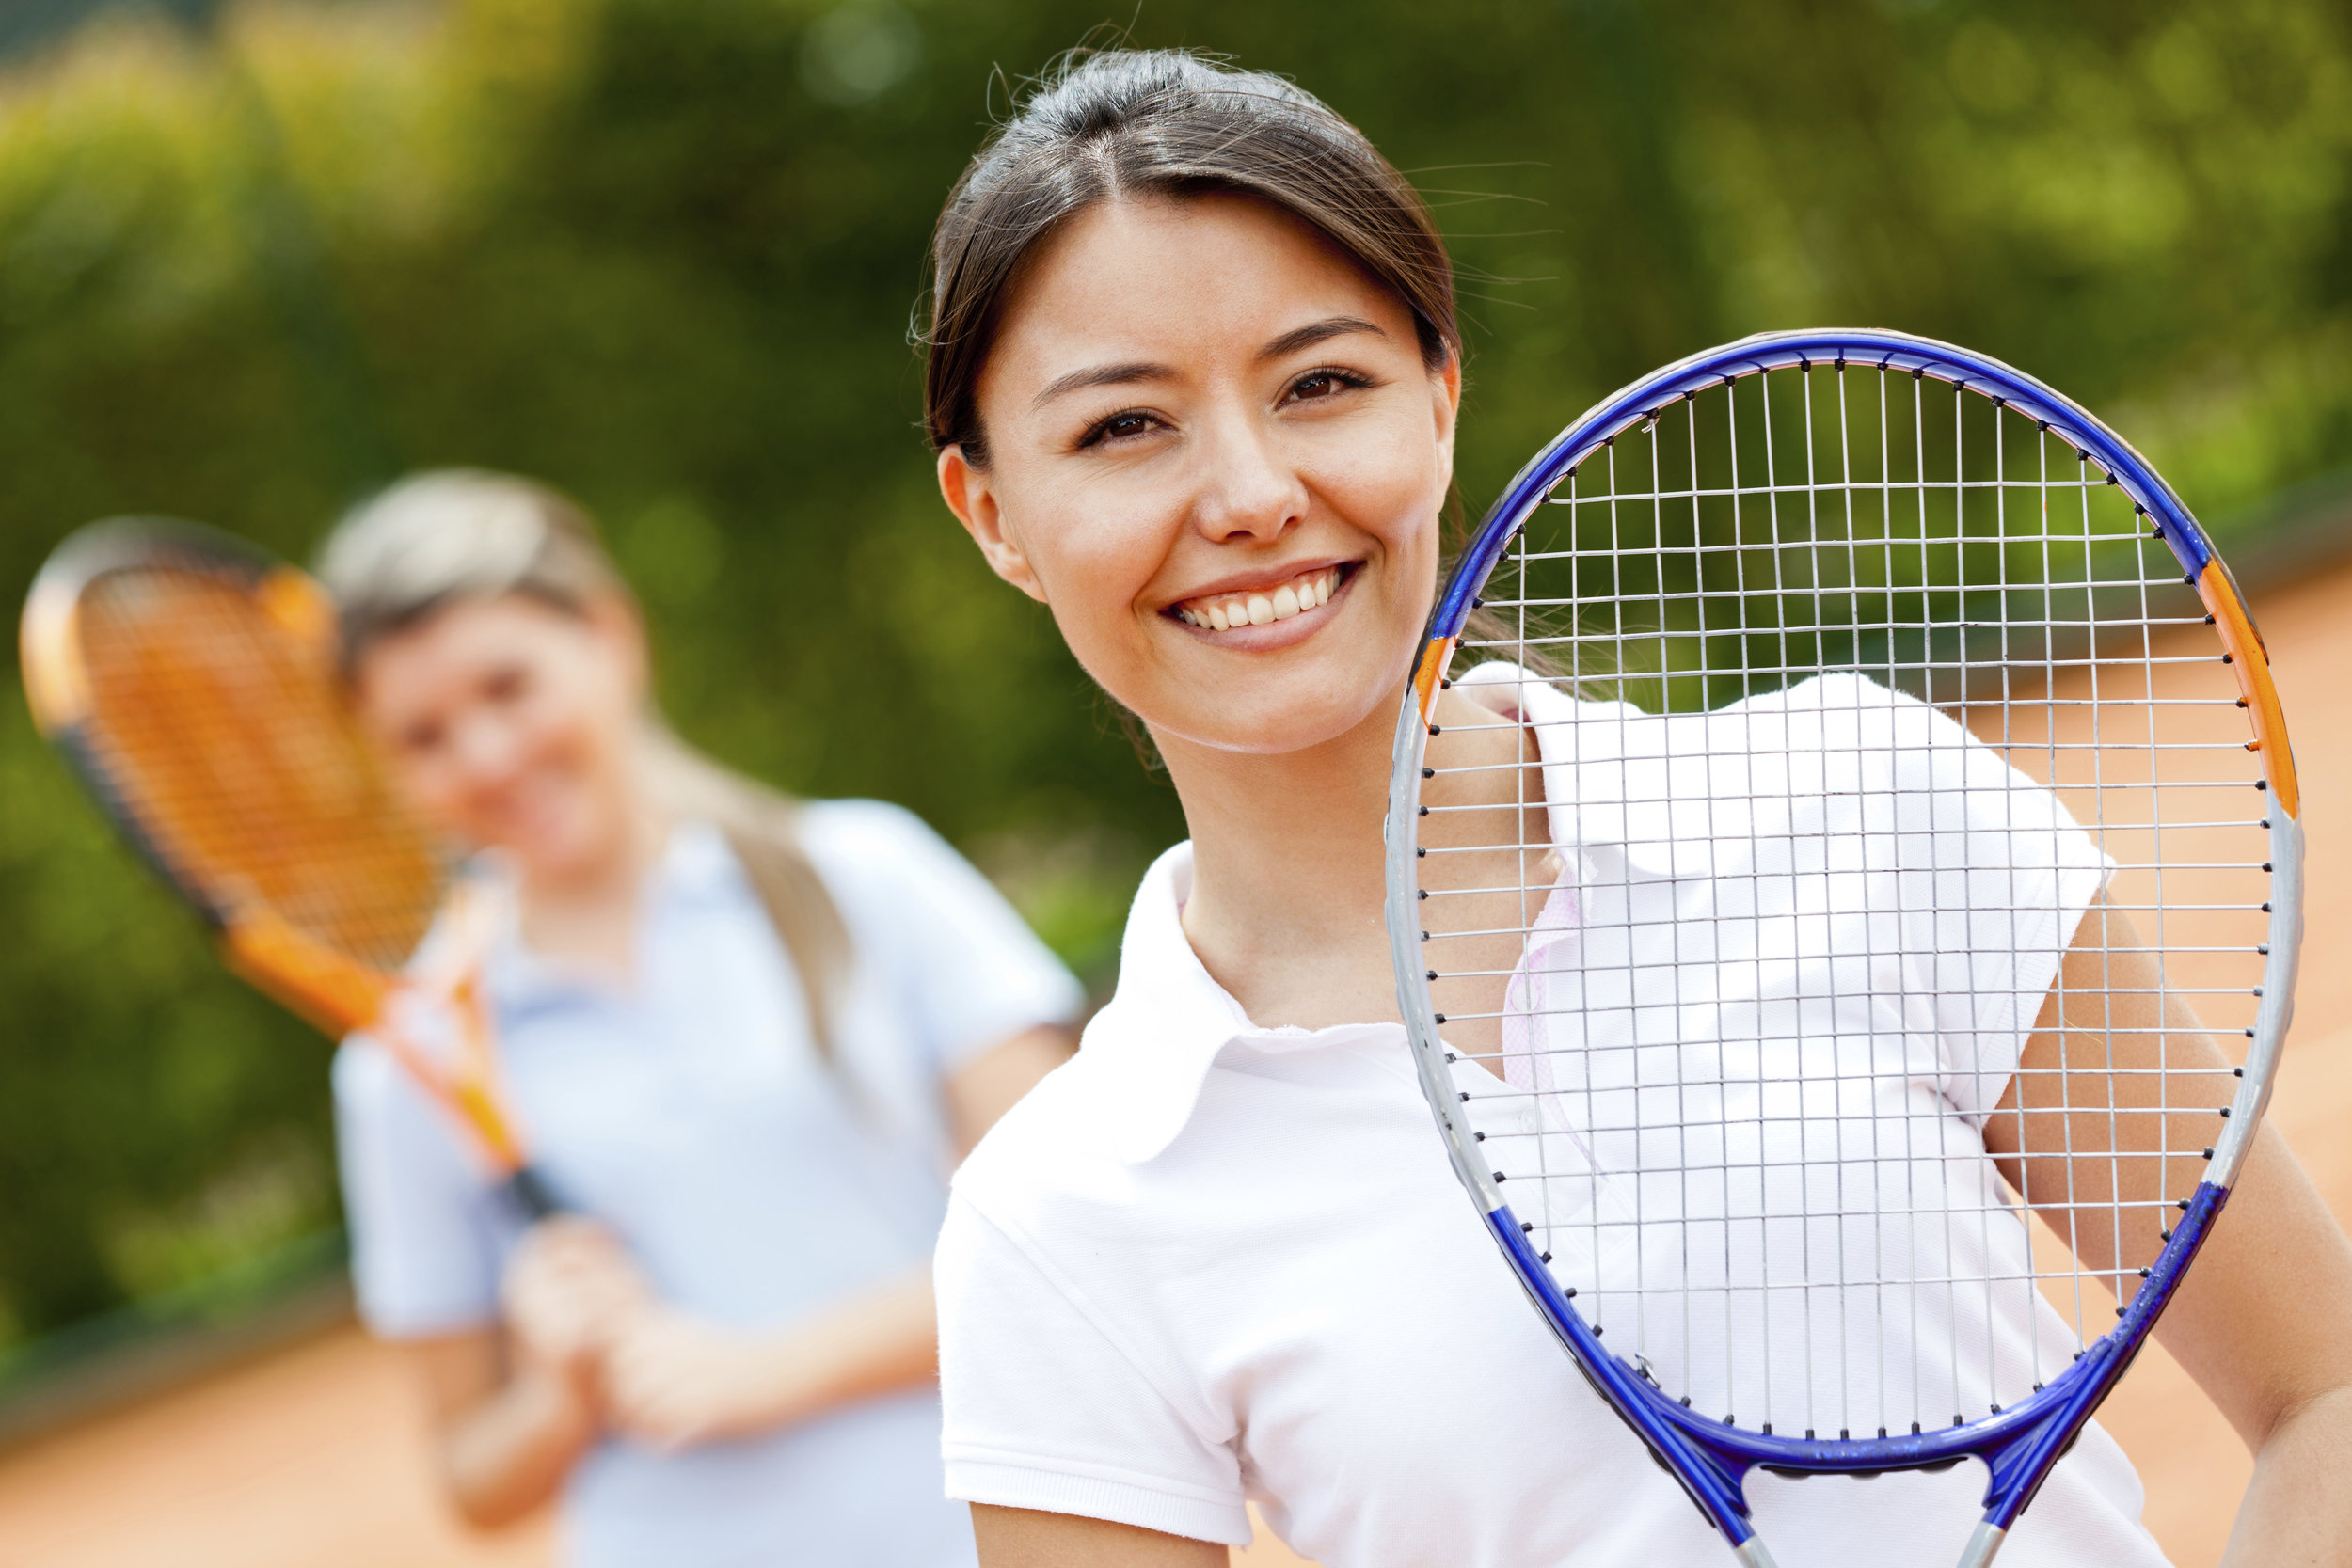 tennis player_iStock_000019477279XXXLarge.jpg